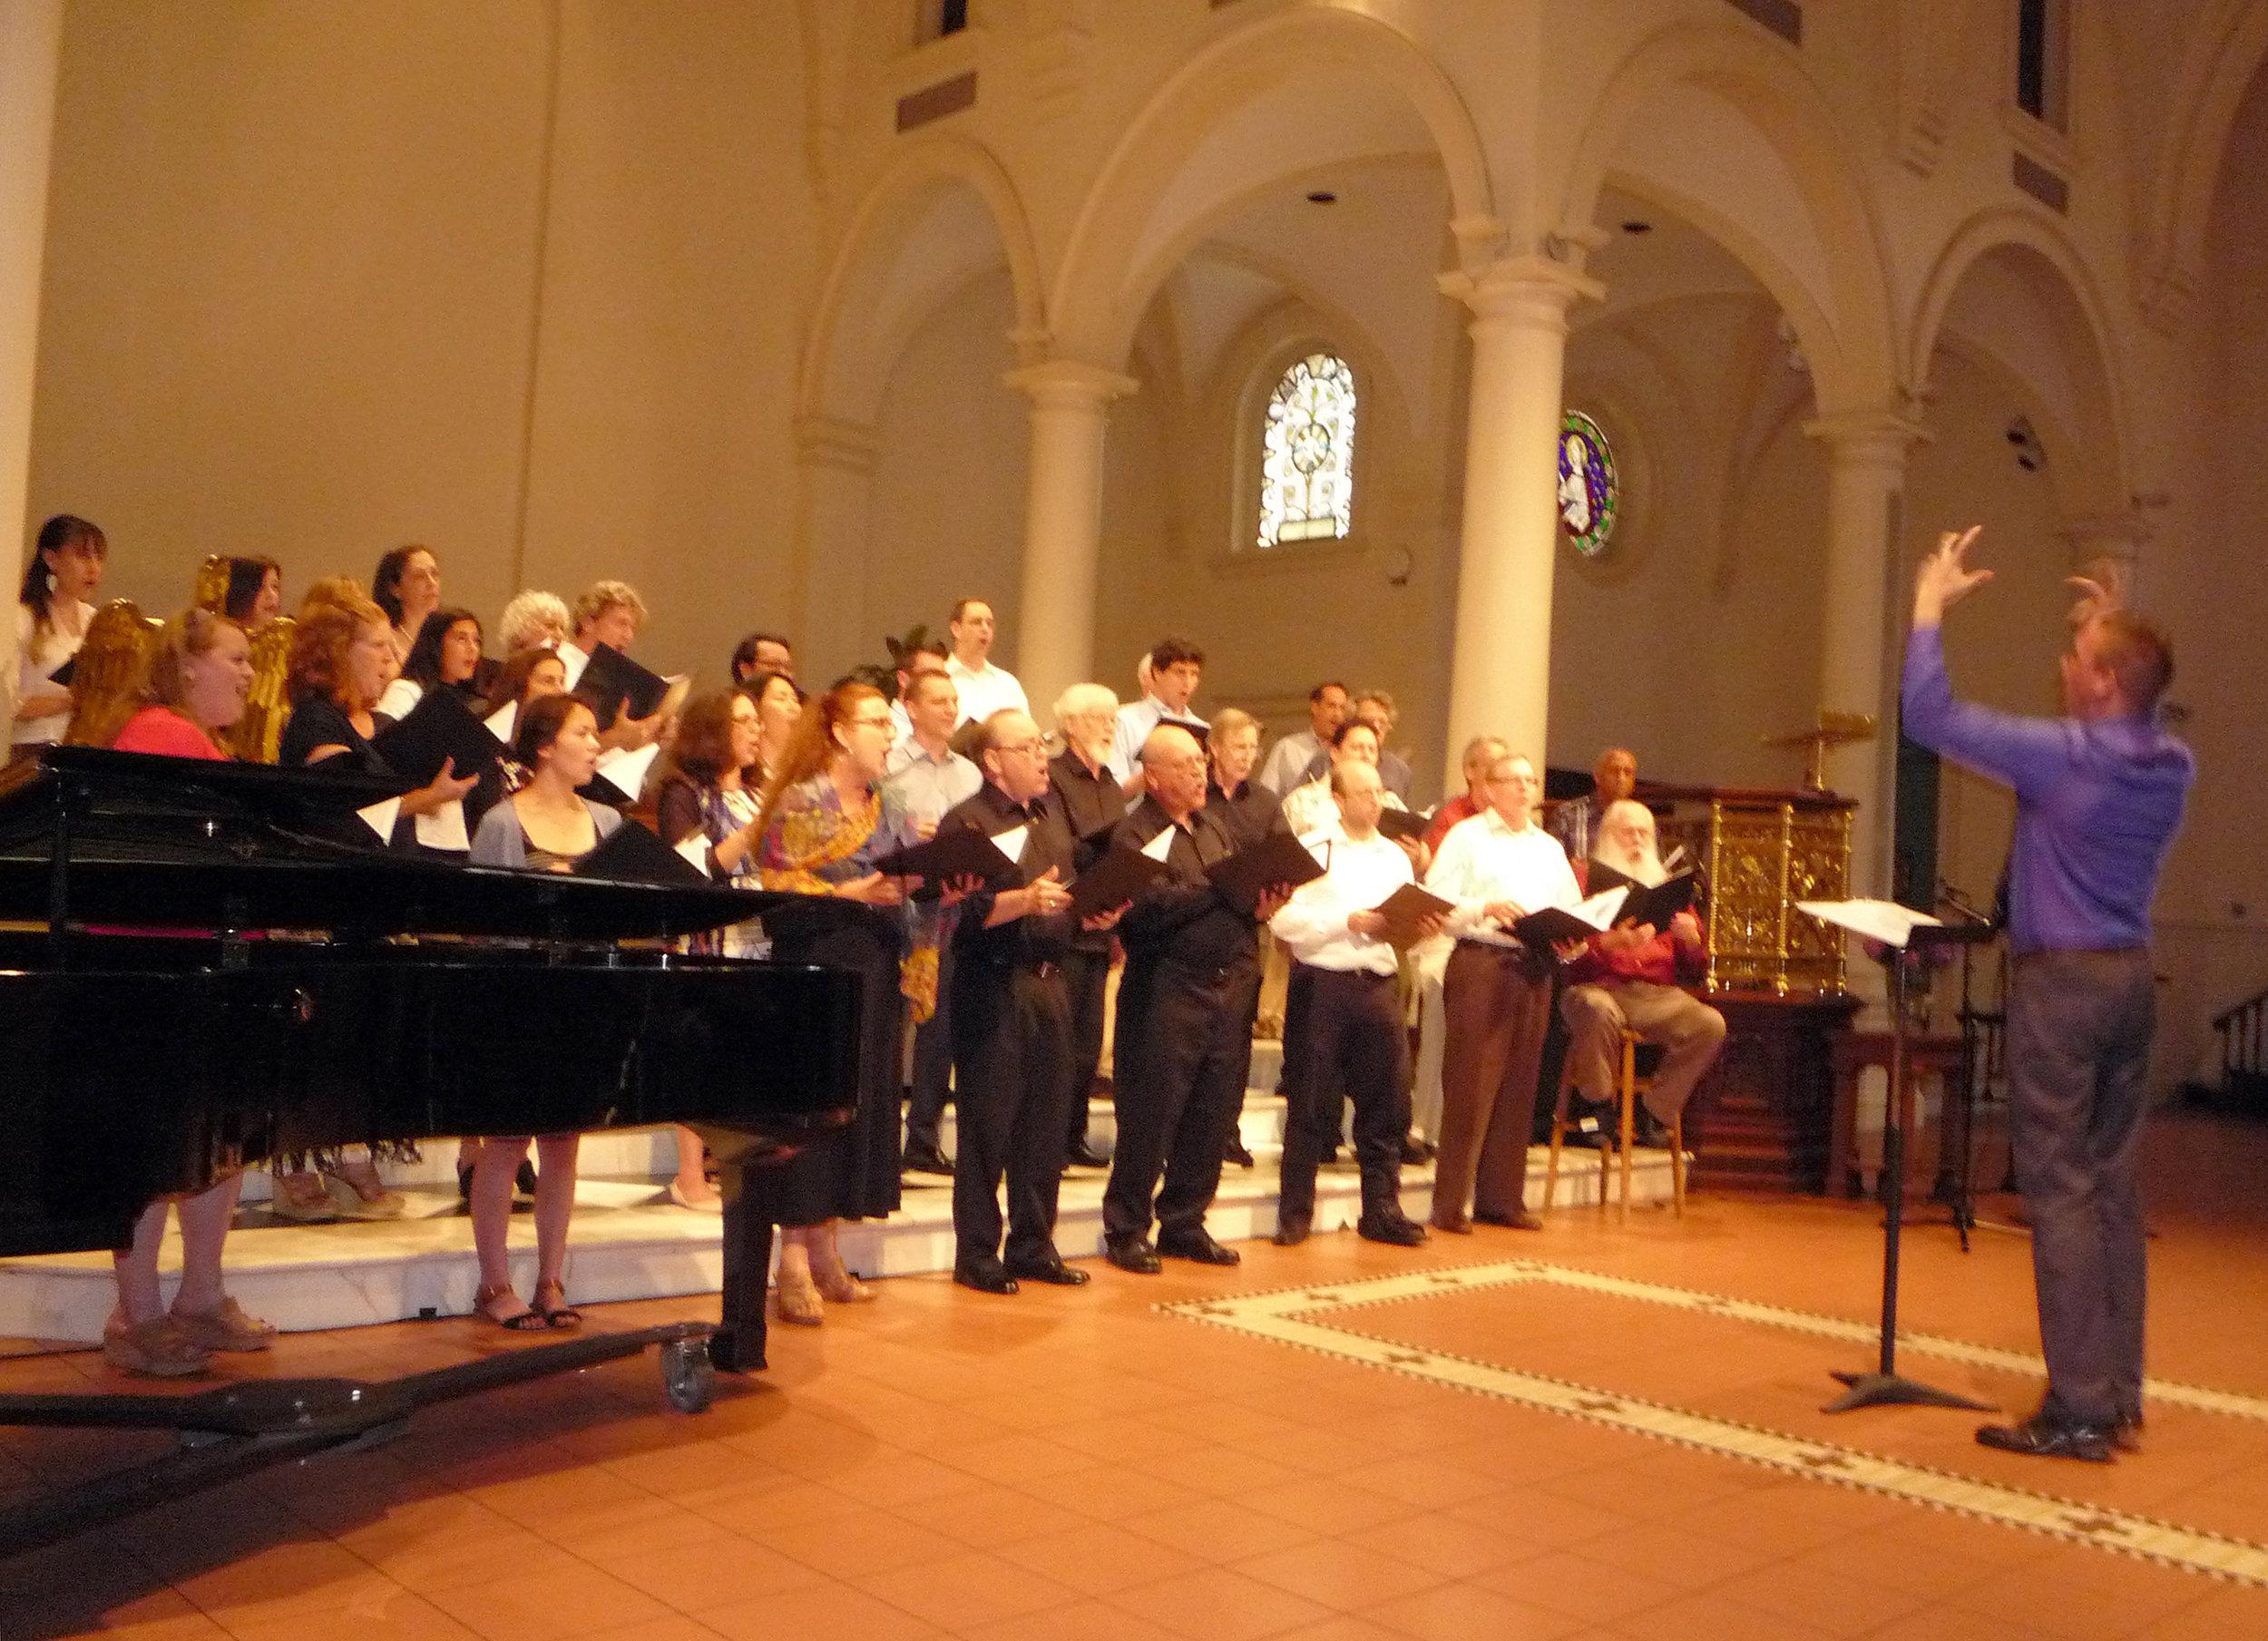 Matthew Oltman conducts the William Appling Tribute Chorus